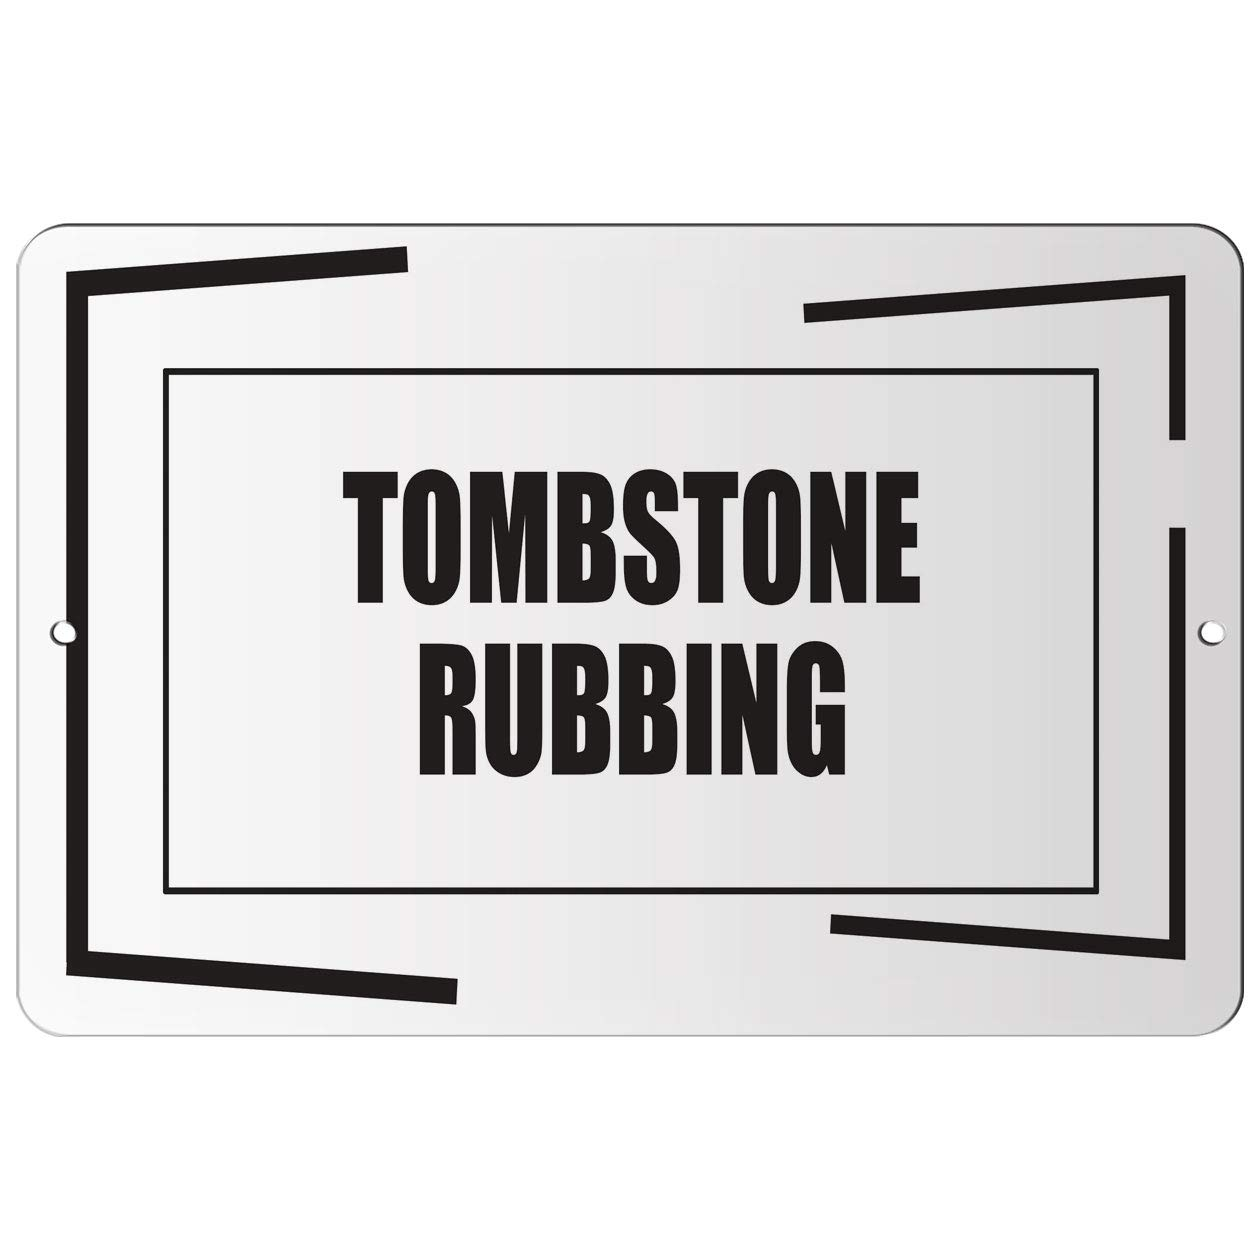 Makoroni - Tombstone RUBBING Hobby - Street Sign 8''x12'' Aluminum by Makoroni